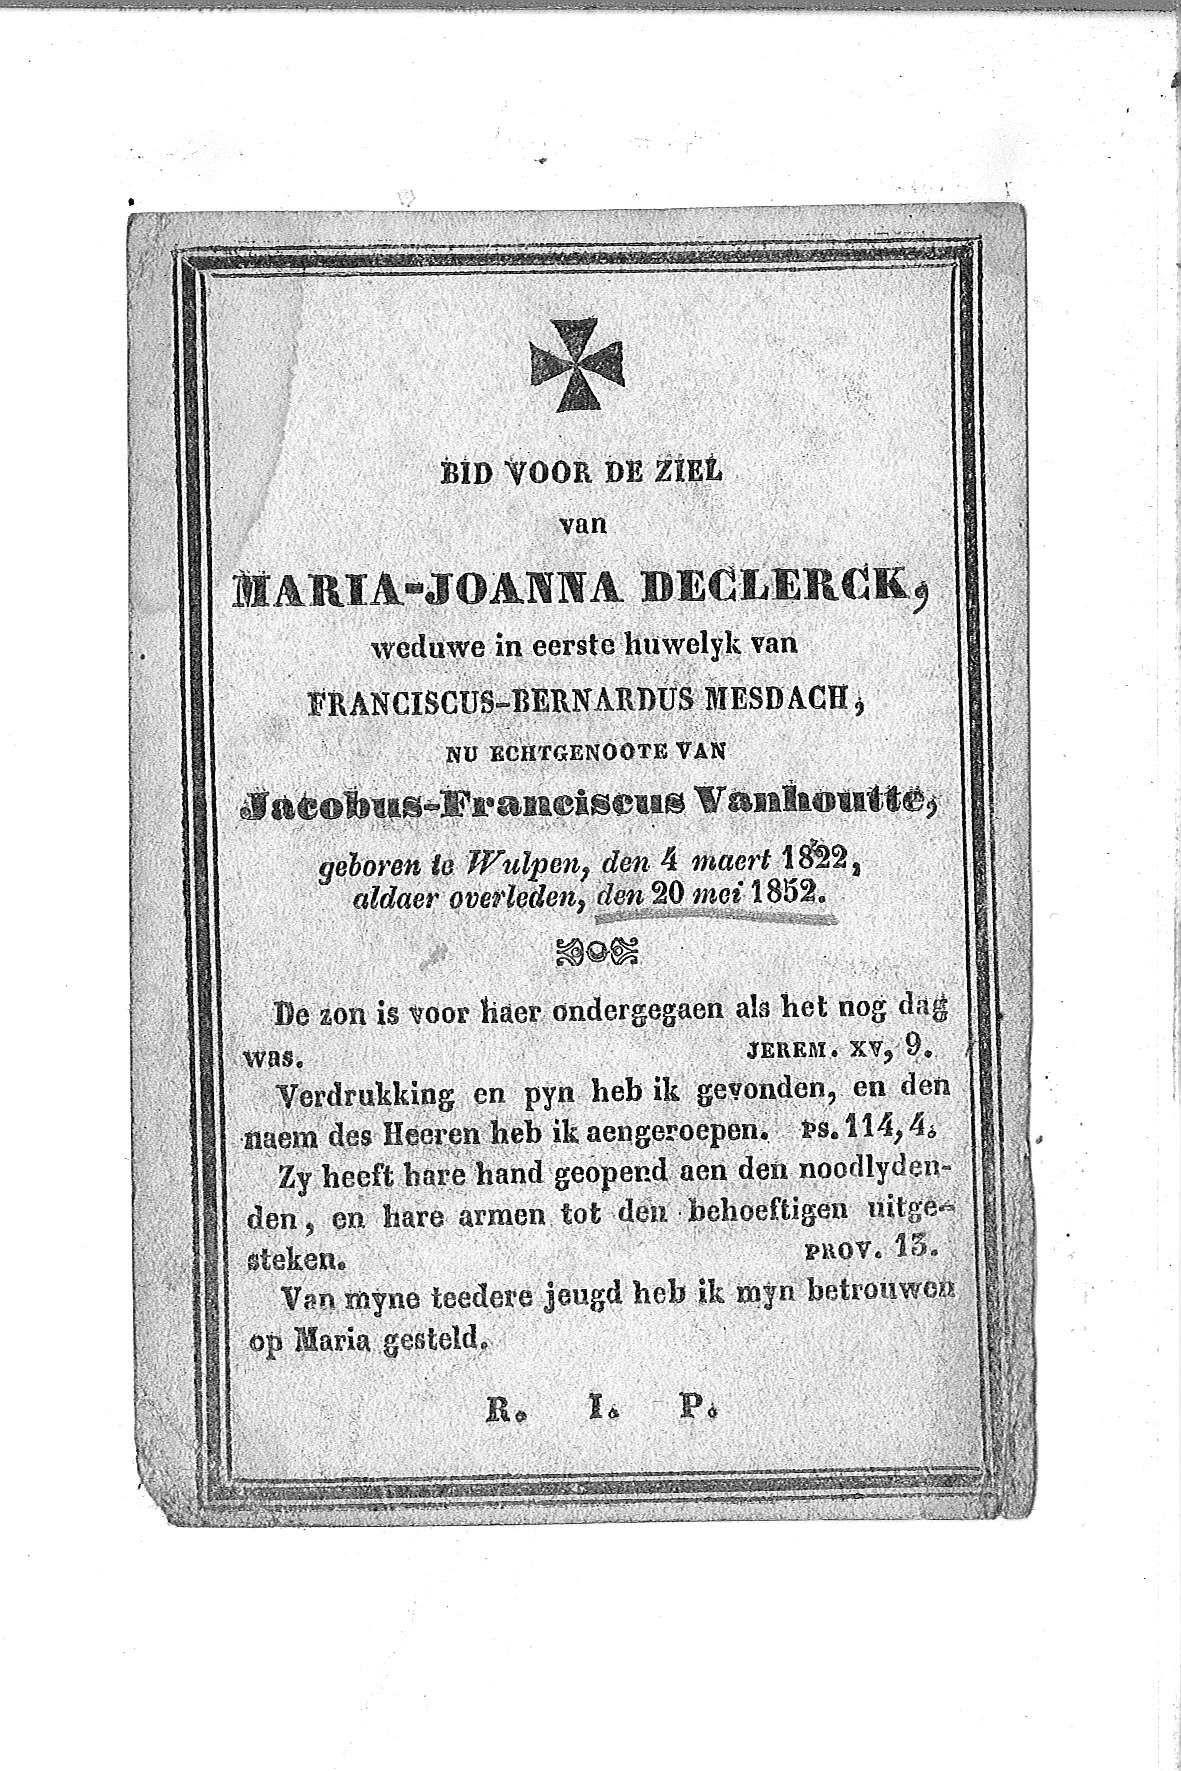 maria-joanna(1852)20120906084901_00009.jpg